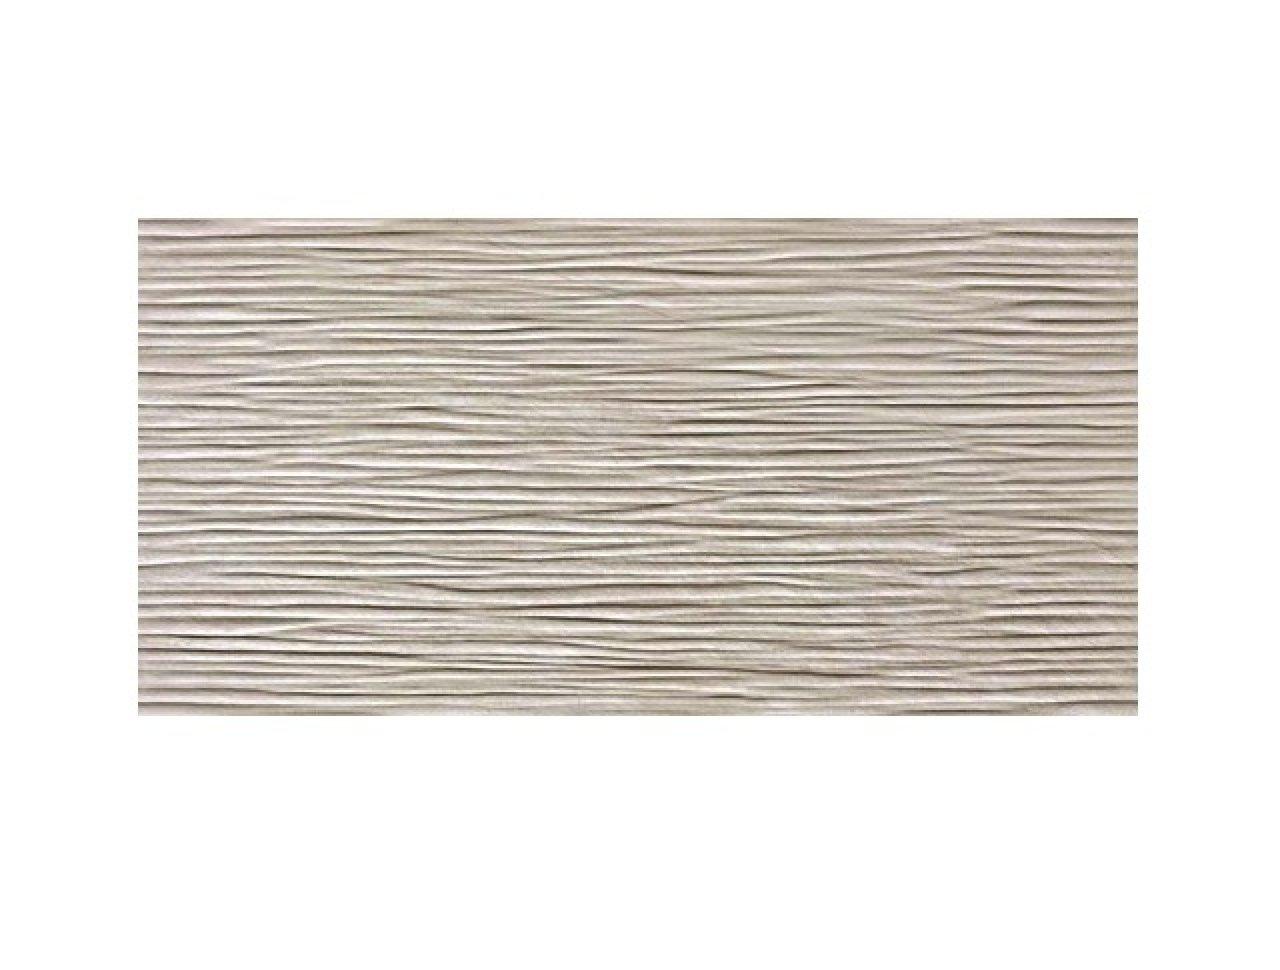 Настенная плитка Brave 3D Wave Pearl 40x80